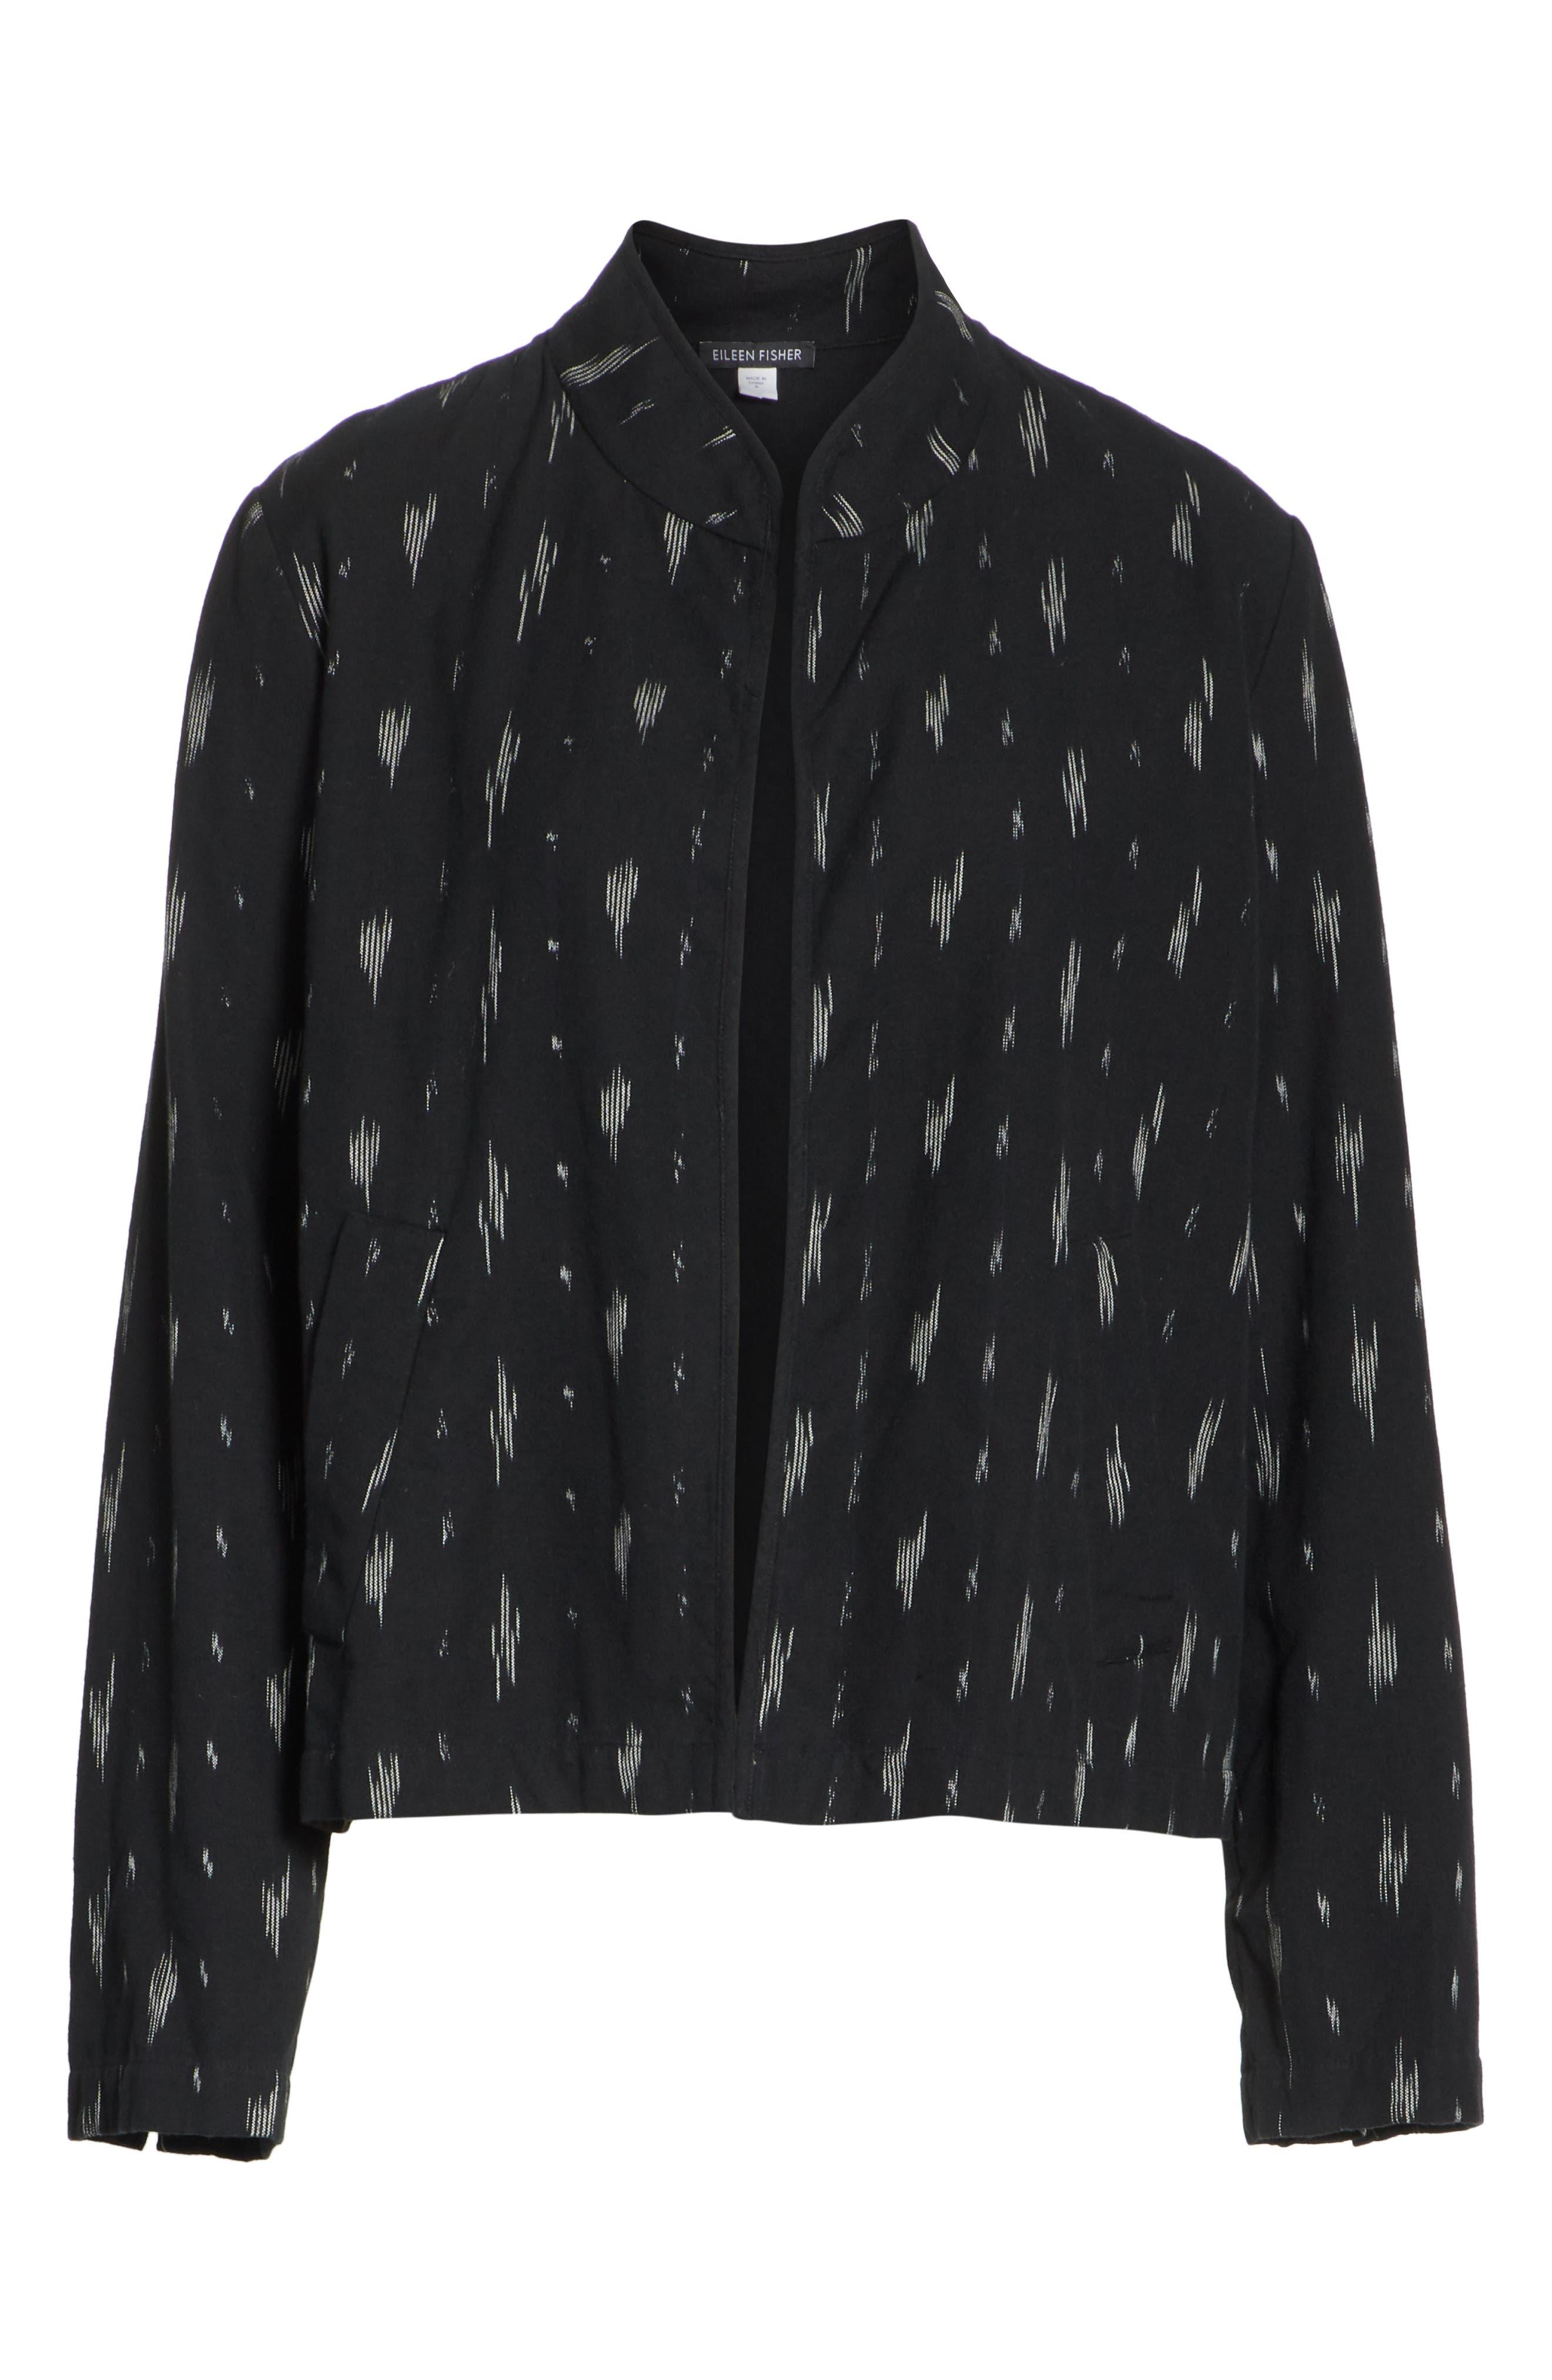 EILEEN FISHER,                             Organic Cotton Jacket,                             Alternate thumbnail 5, color,                             001